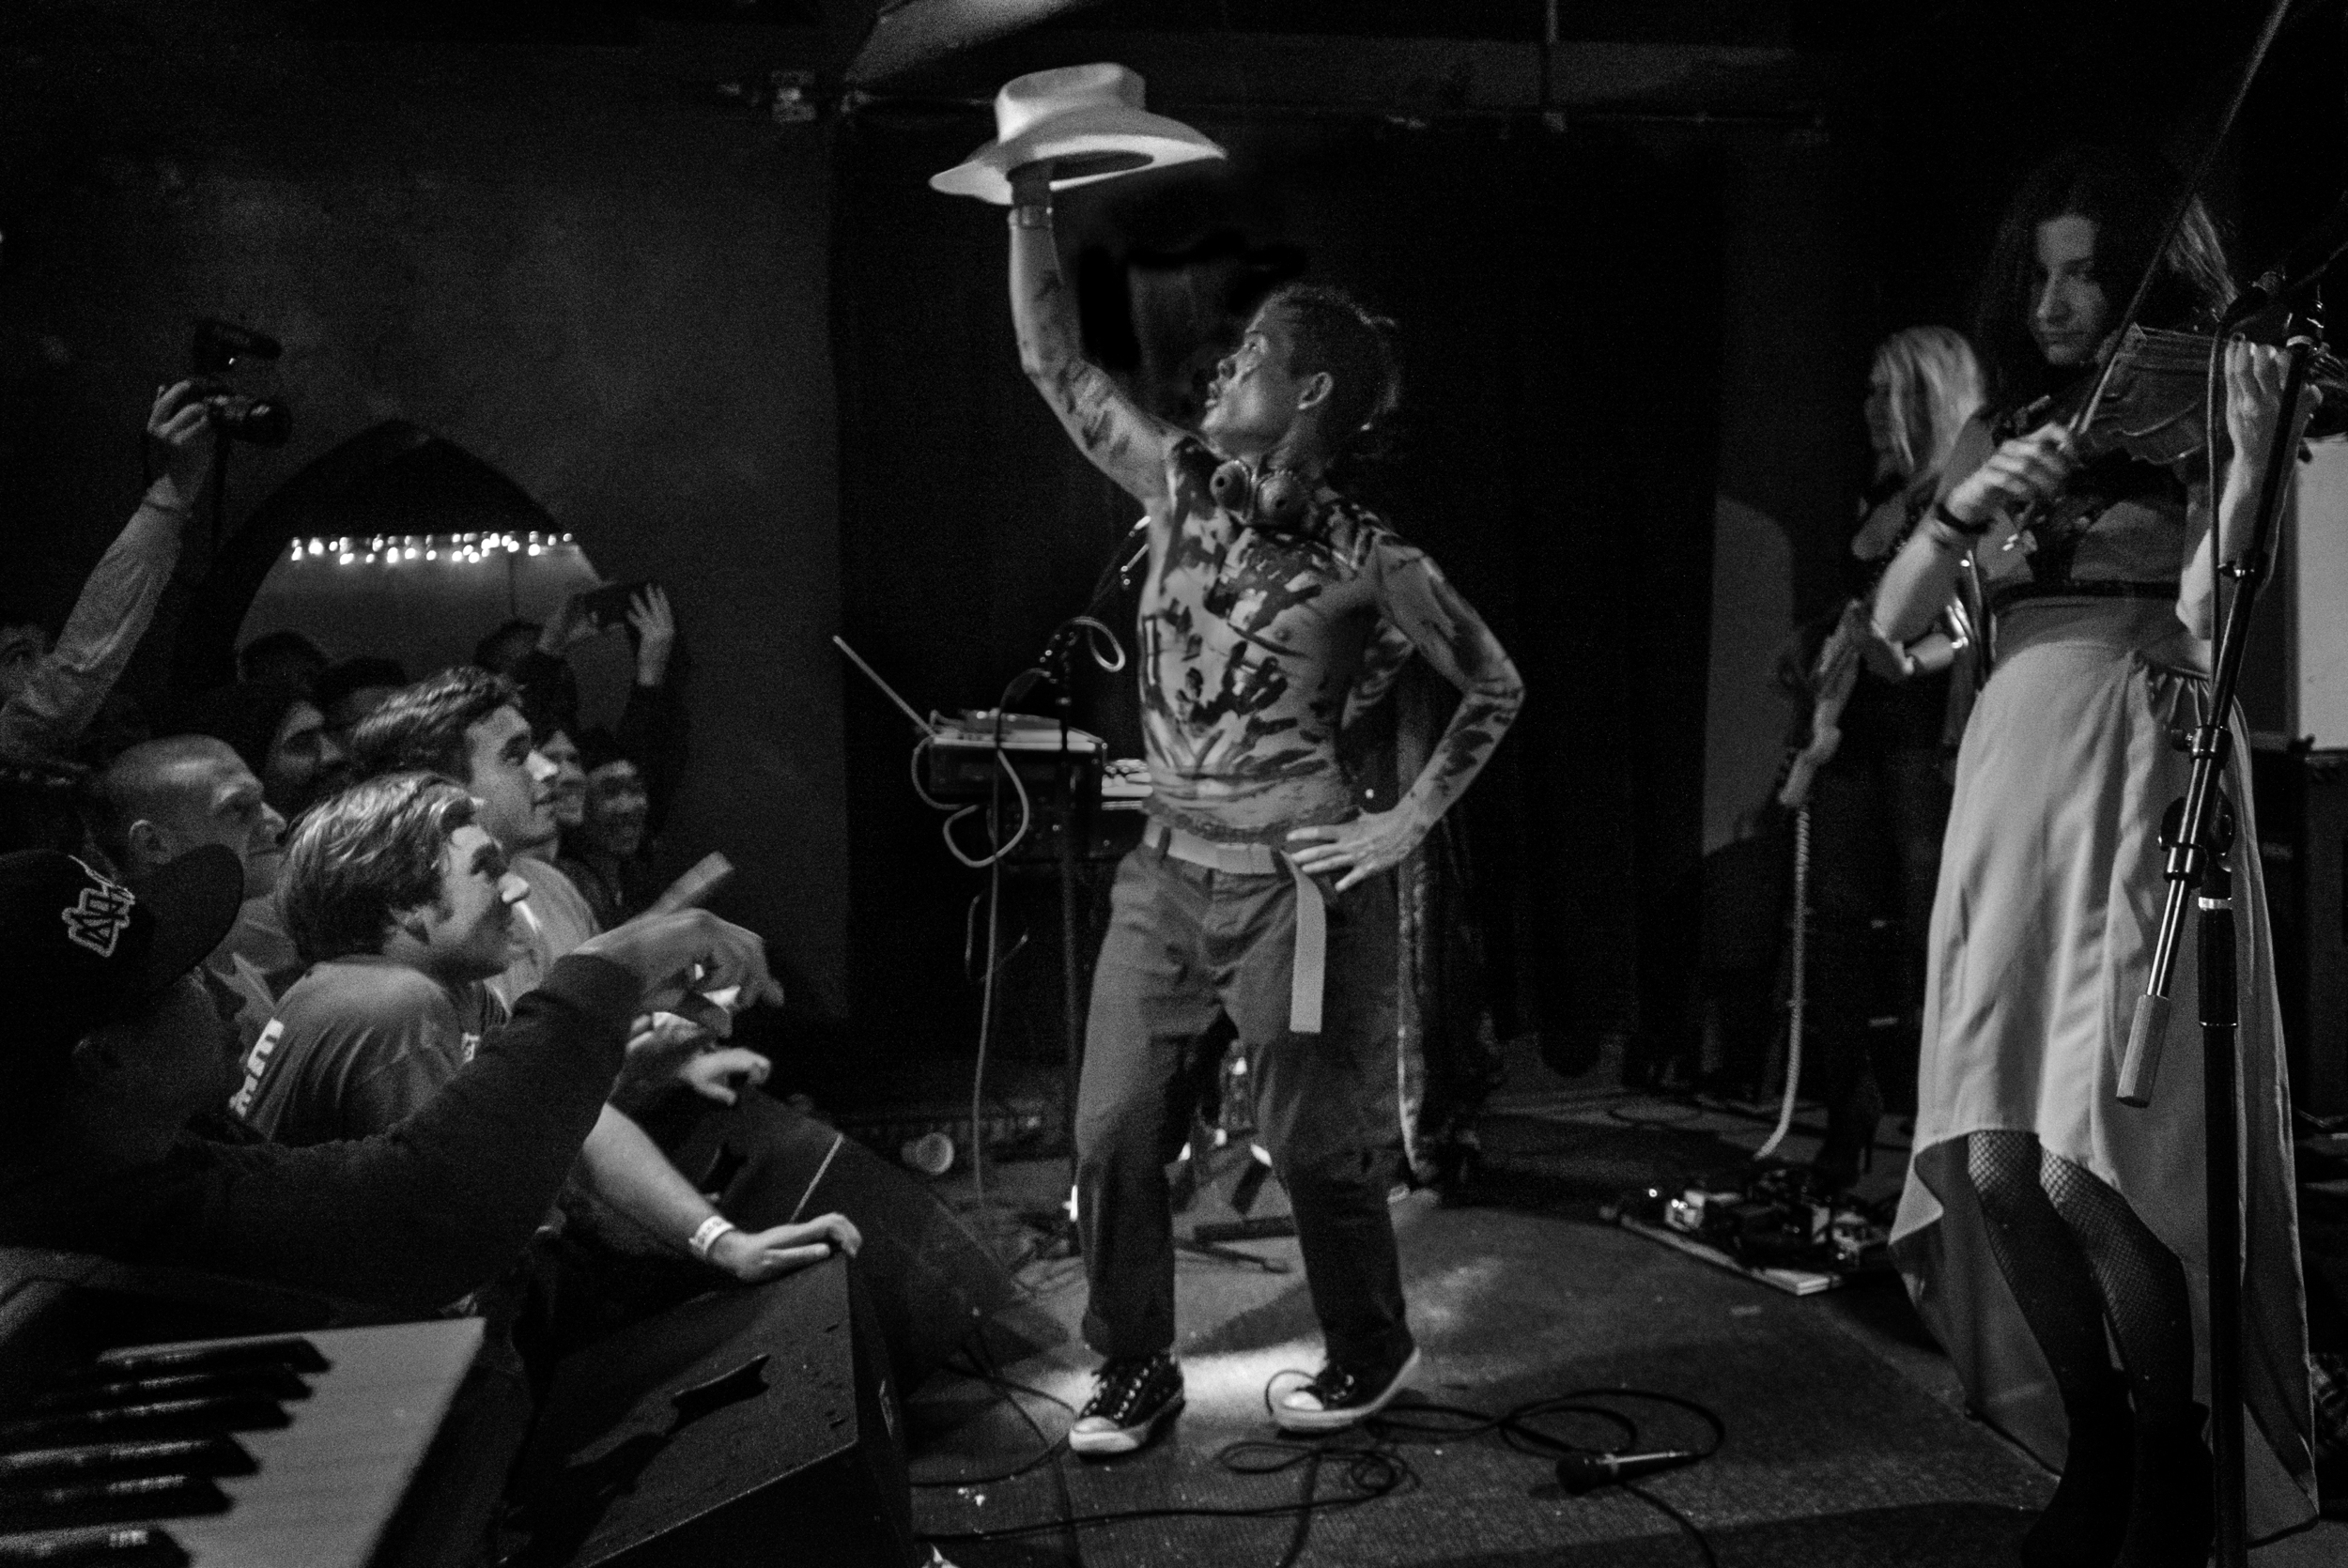 david-choe-mangchi-under-the-cobbletones-lulu-east-coast-tour-2016-tour-live-music-6.jpg